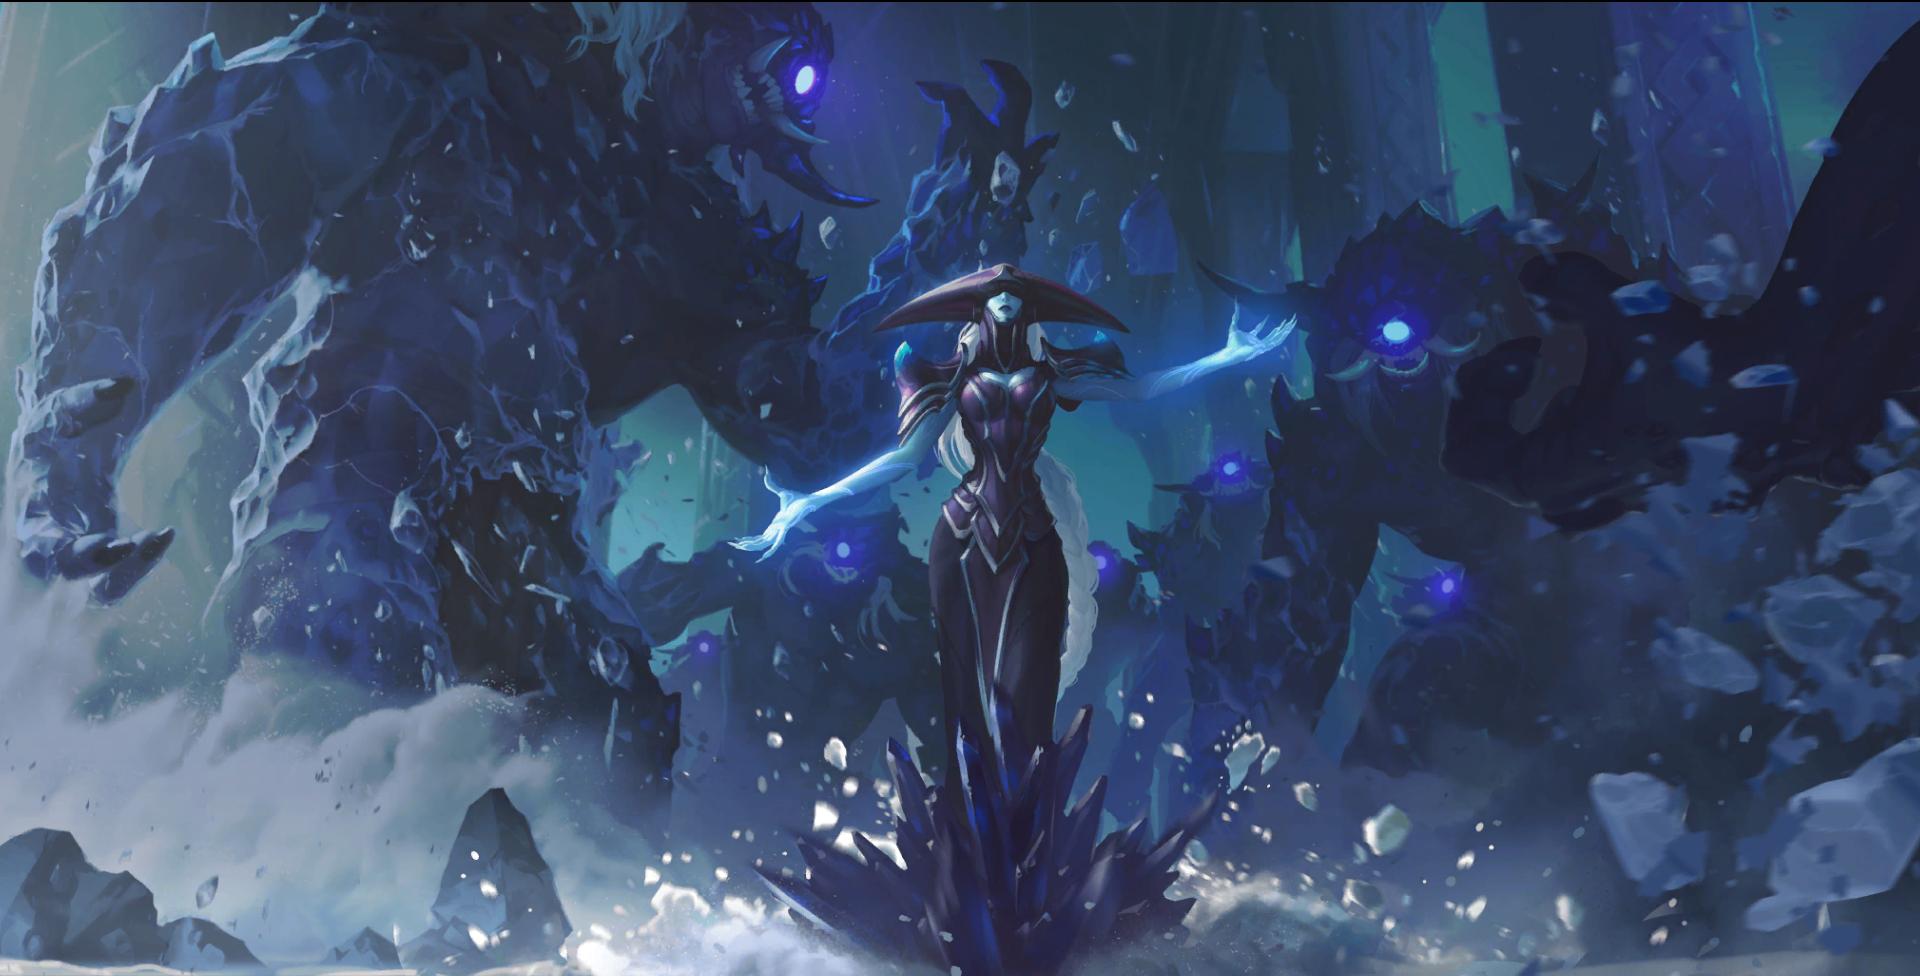 League Of Legends Legends Of Runeterra PC Gaming Video Game Art Fantasy Art Fantasy Girl 1920x976